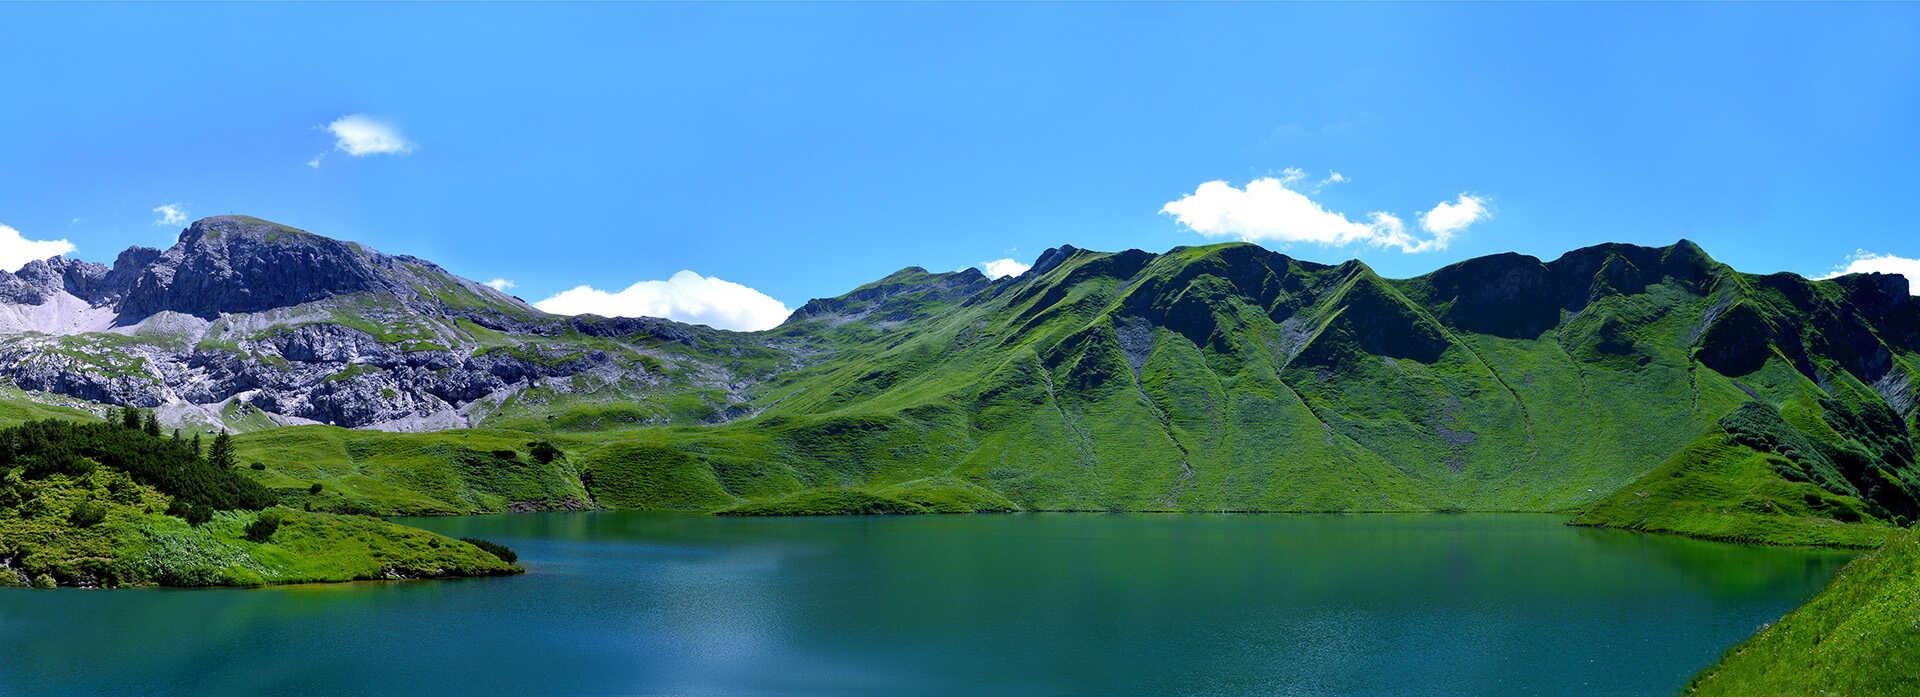 mountains with a lake